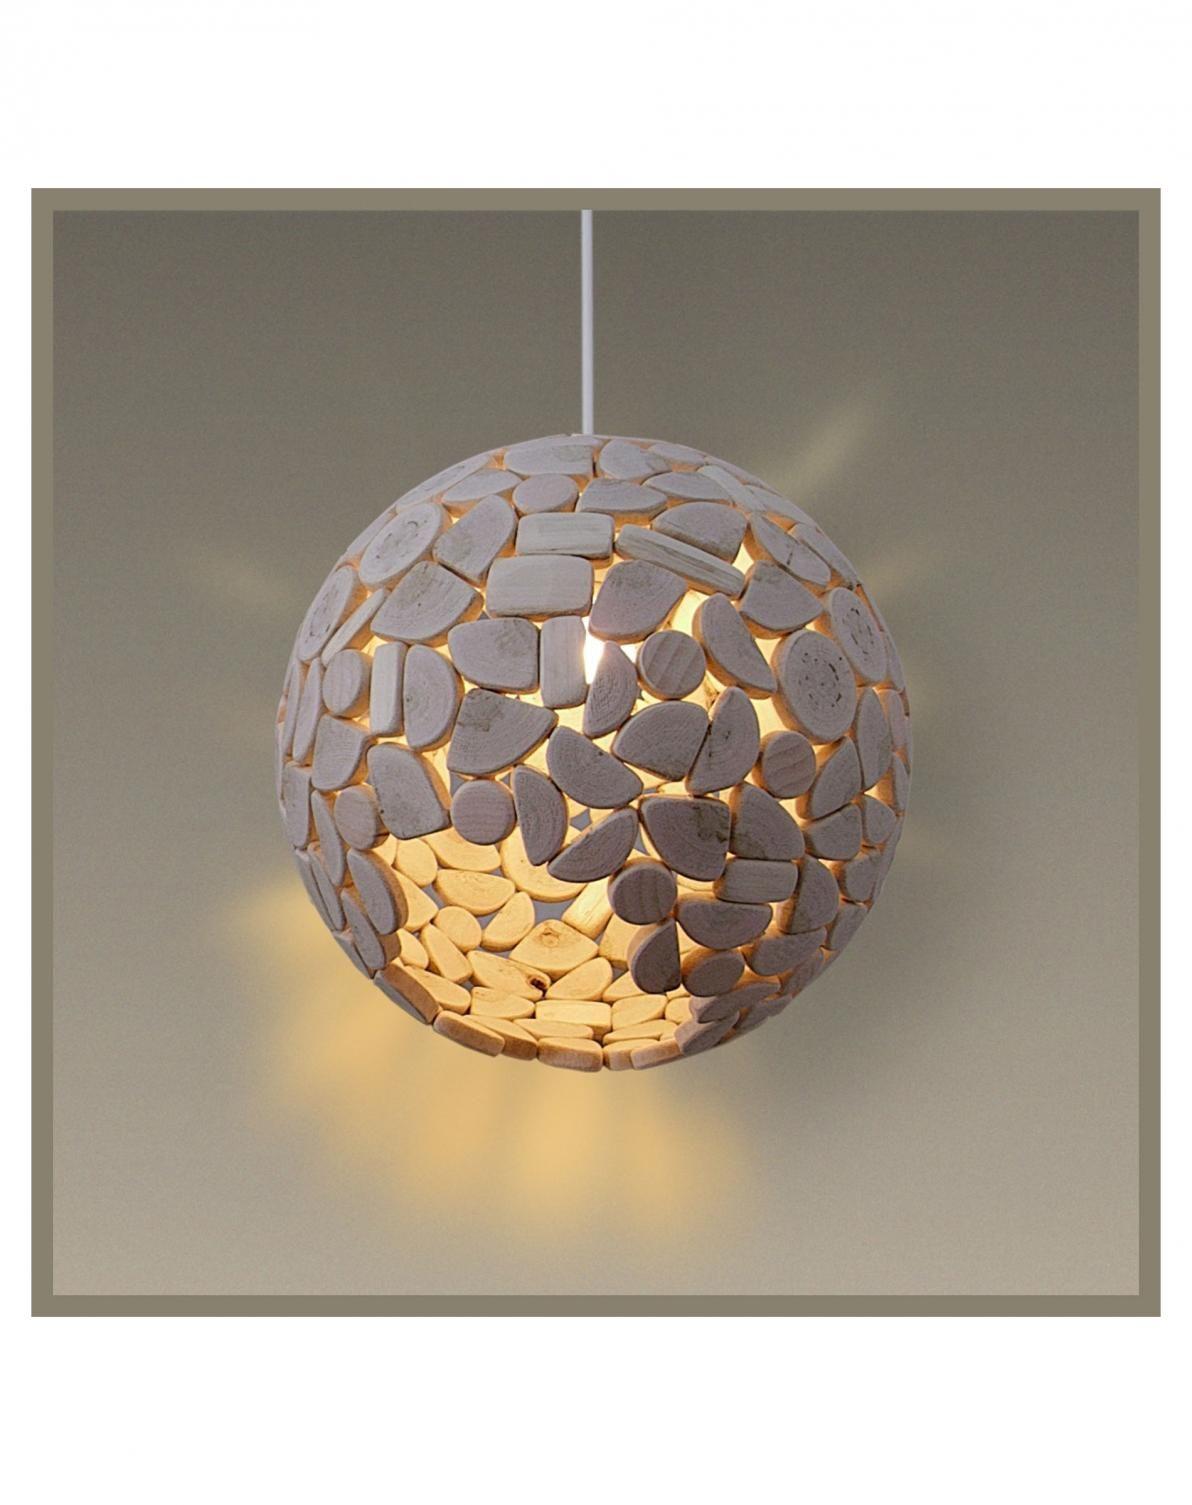 Lamp made google paieka lamps pinterest bulbs lamp made google paieka handmade lampshandmade arubaitofo Gallery